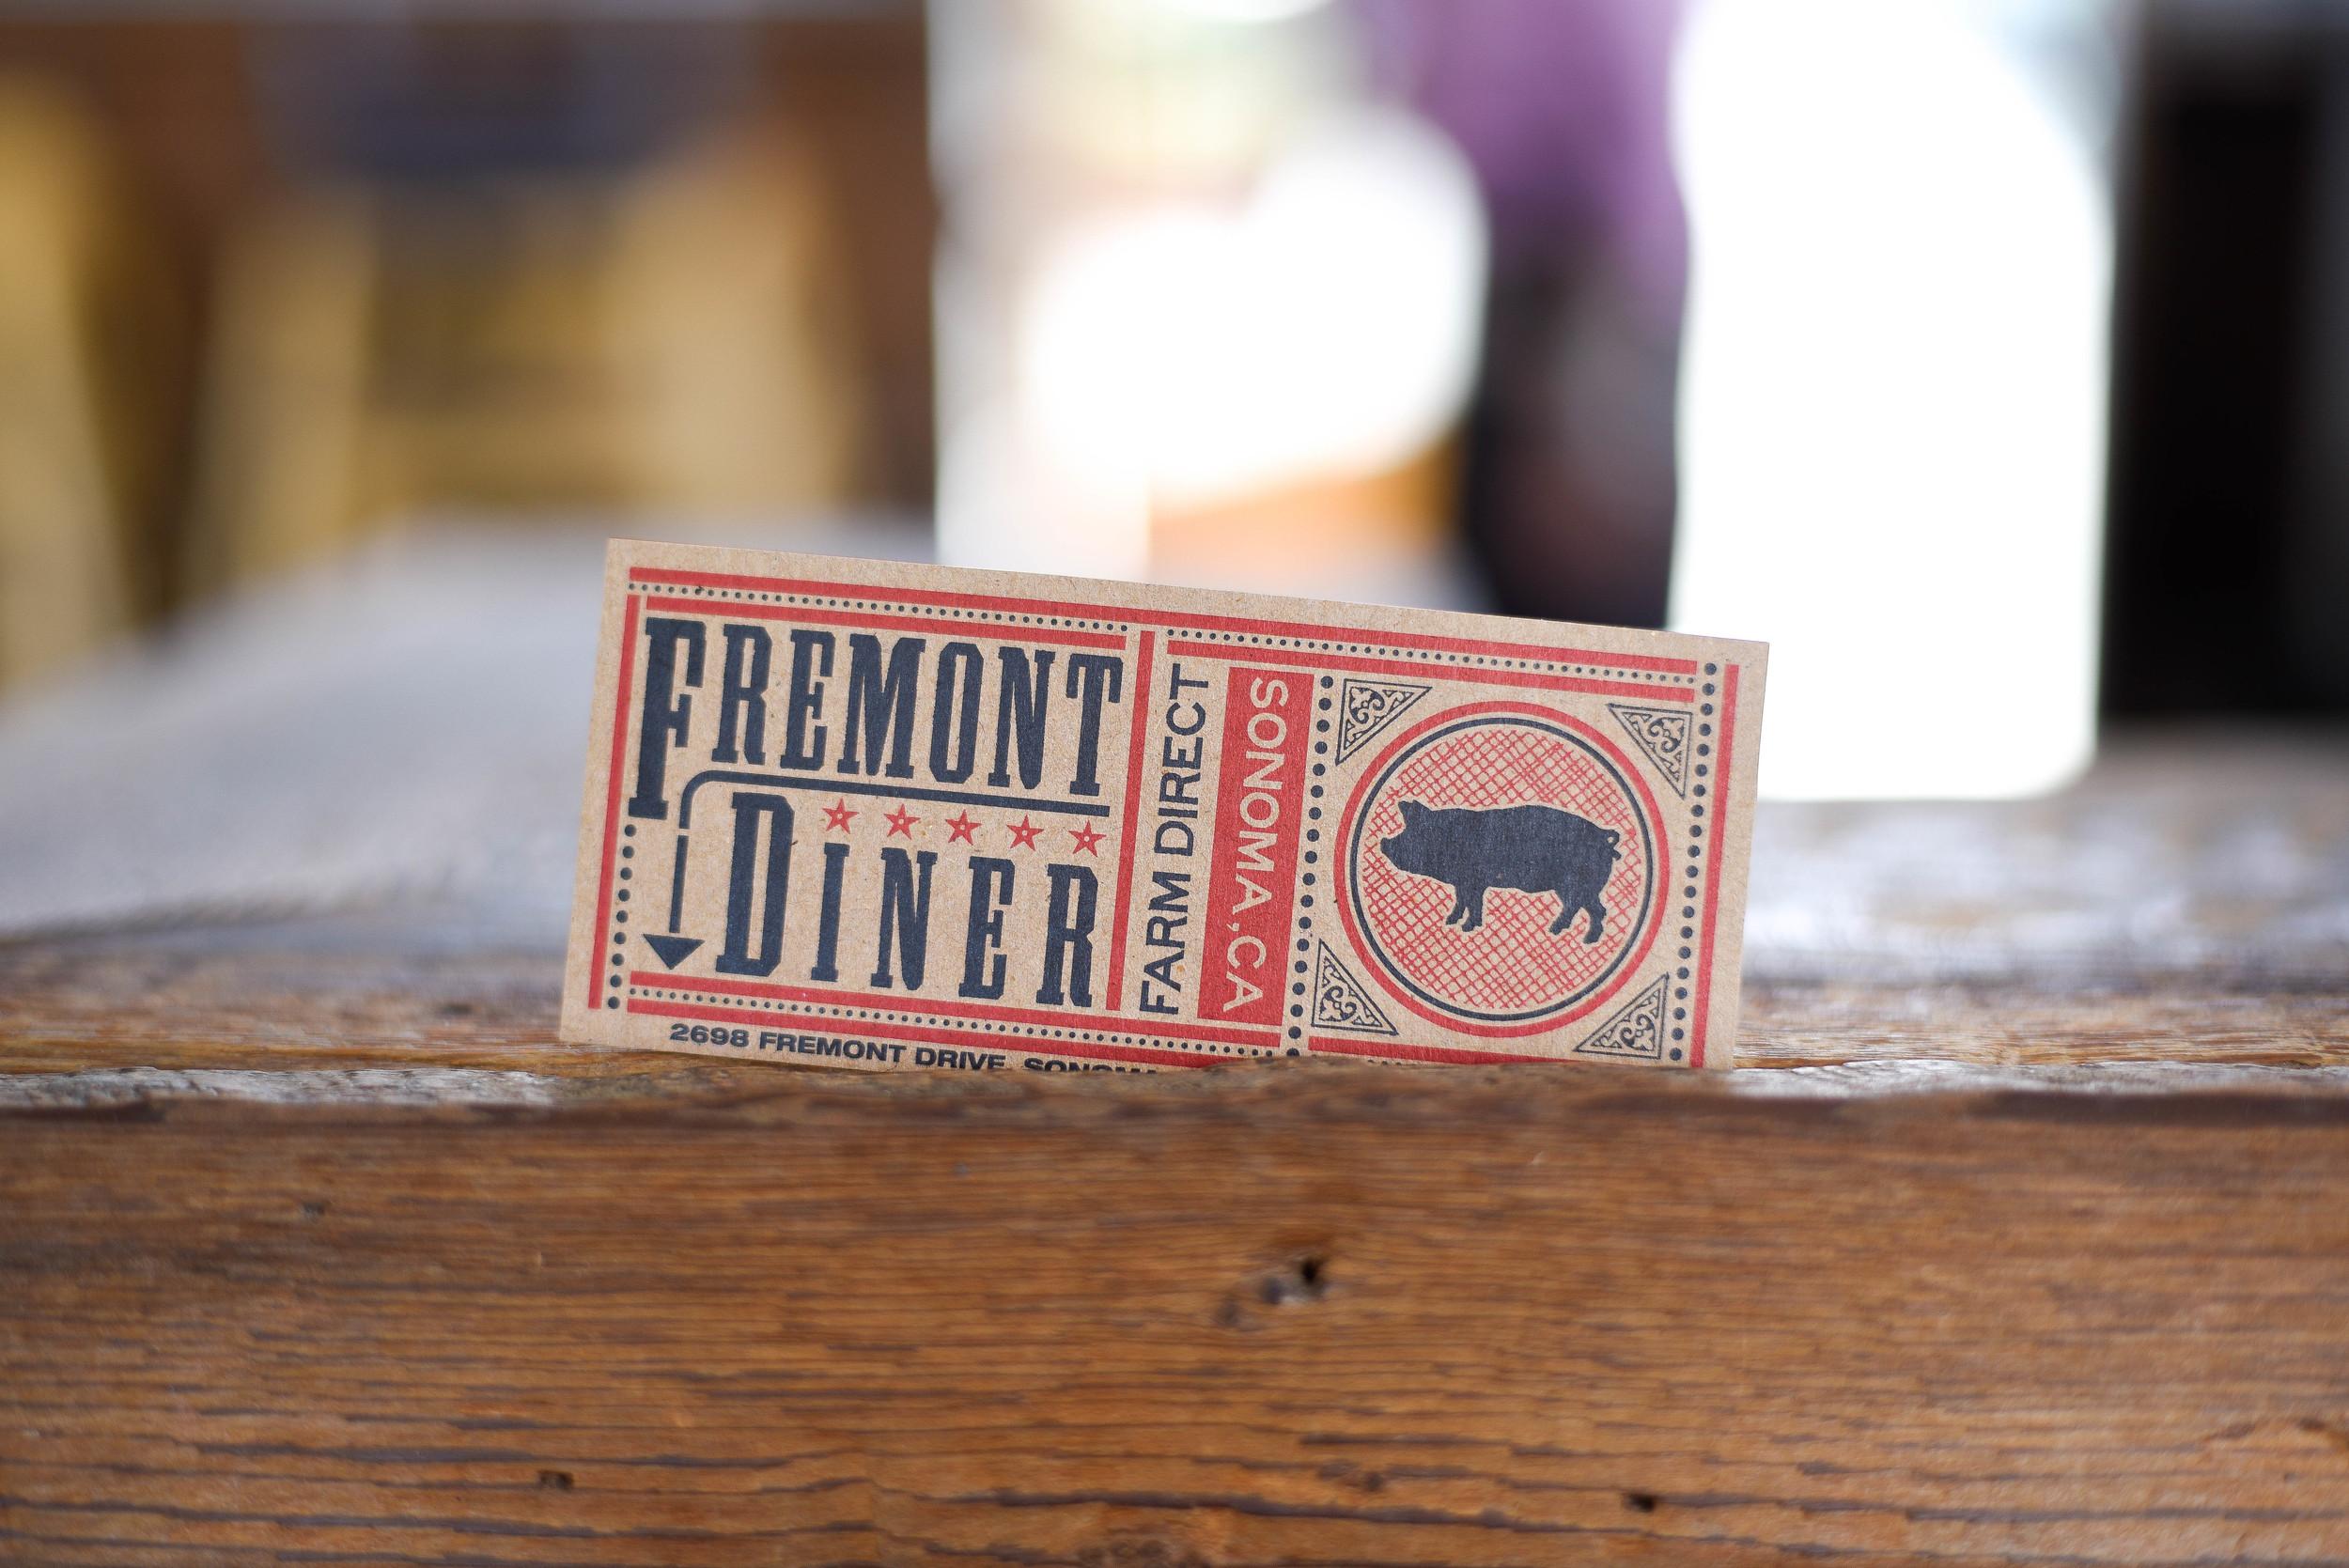 Fremont Diner in Sonoma | asavvylifestyle.com